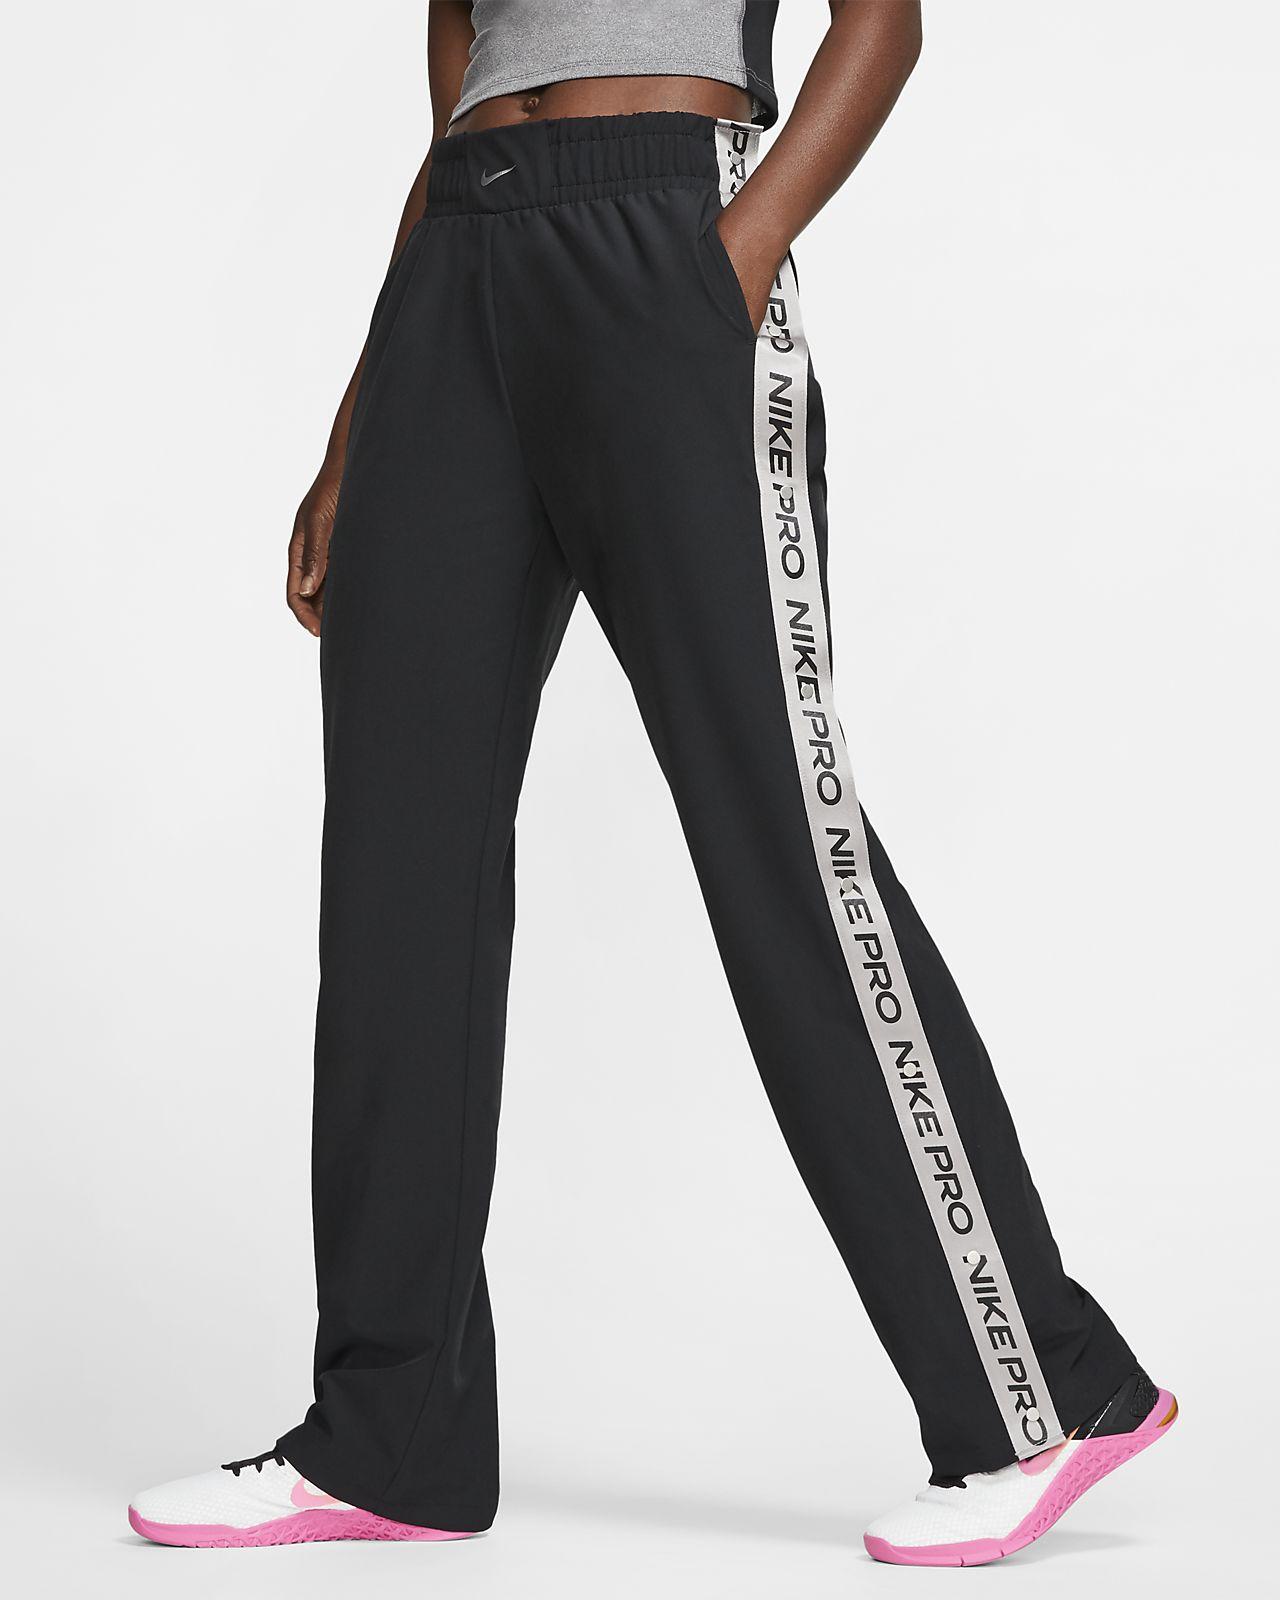 Nike Pro Tearaway-broek voor dames